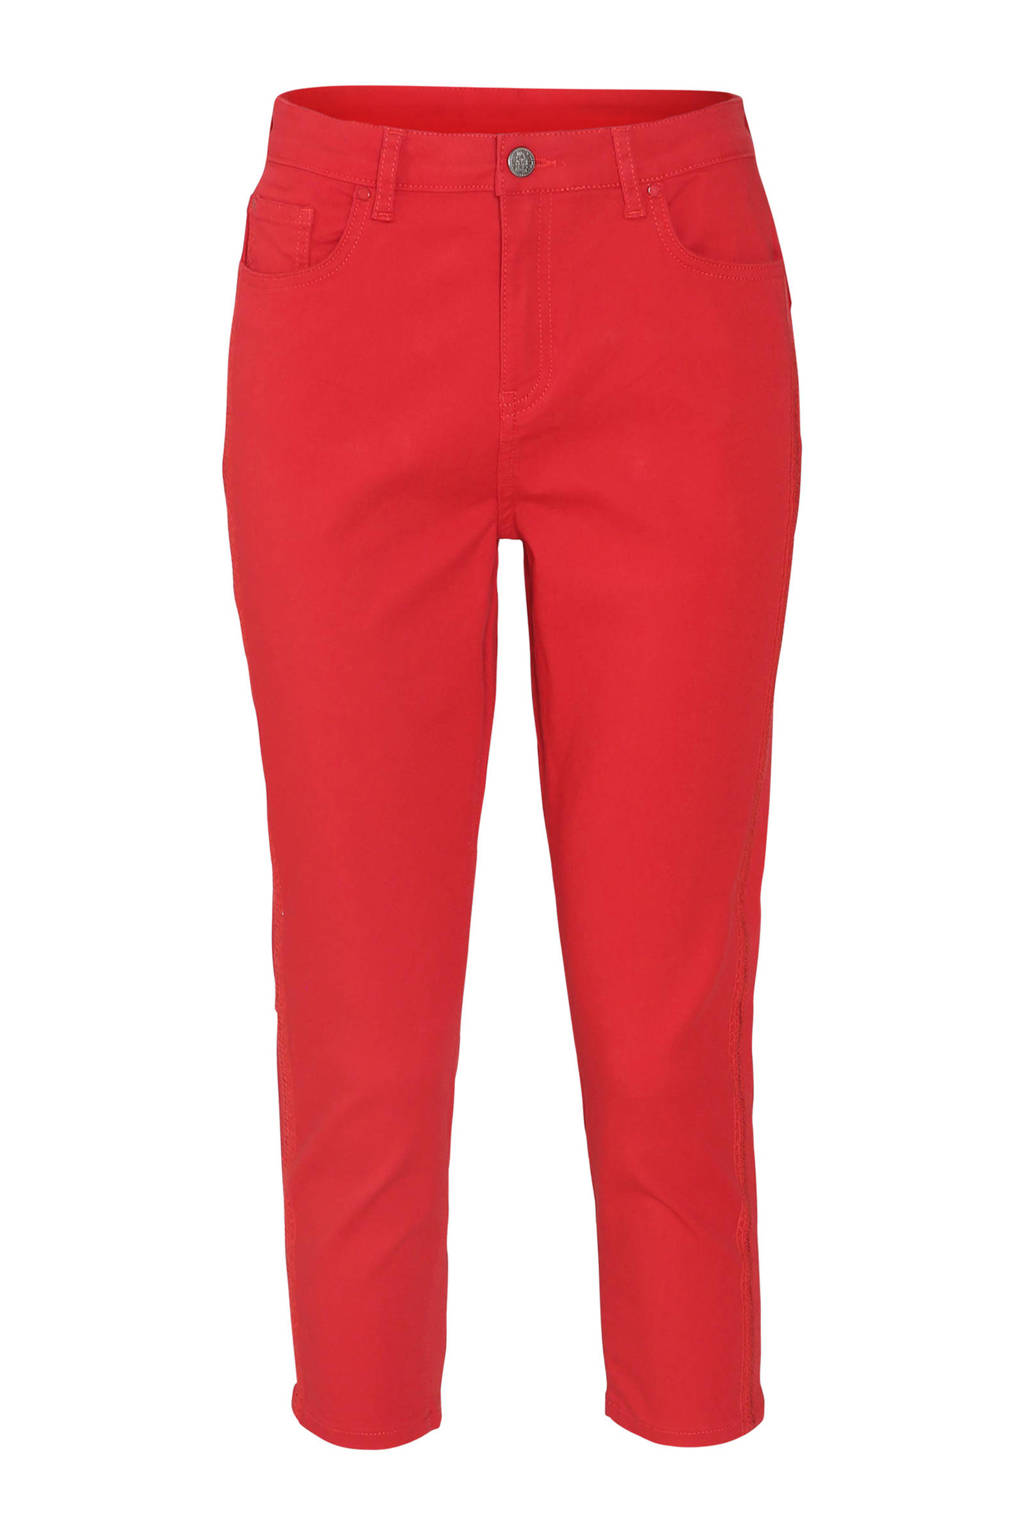 Cassis cropped regular fit broek met pailletten rood, Rood